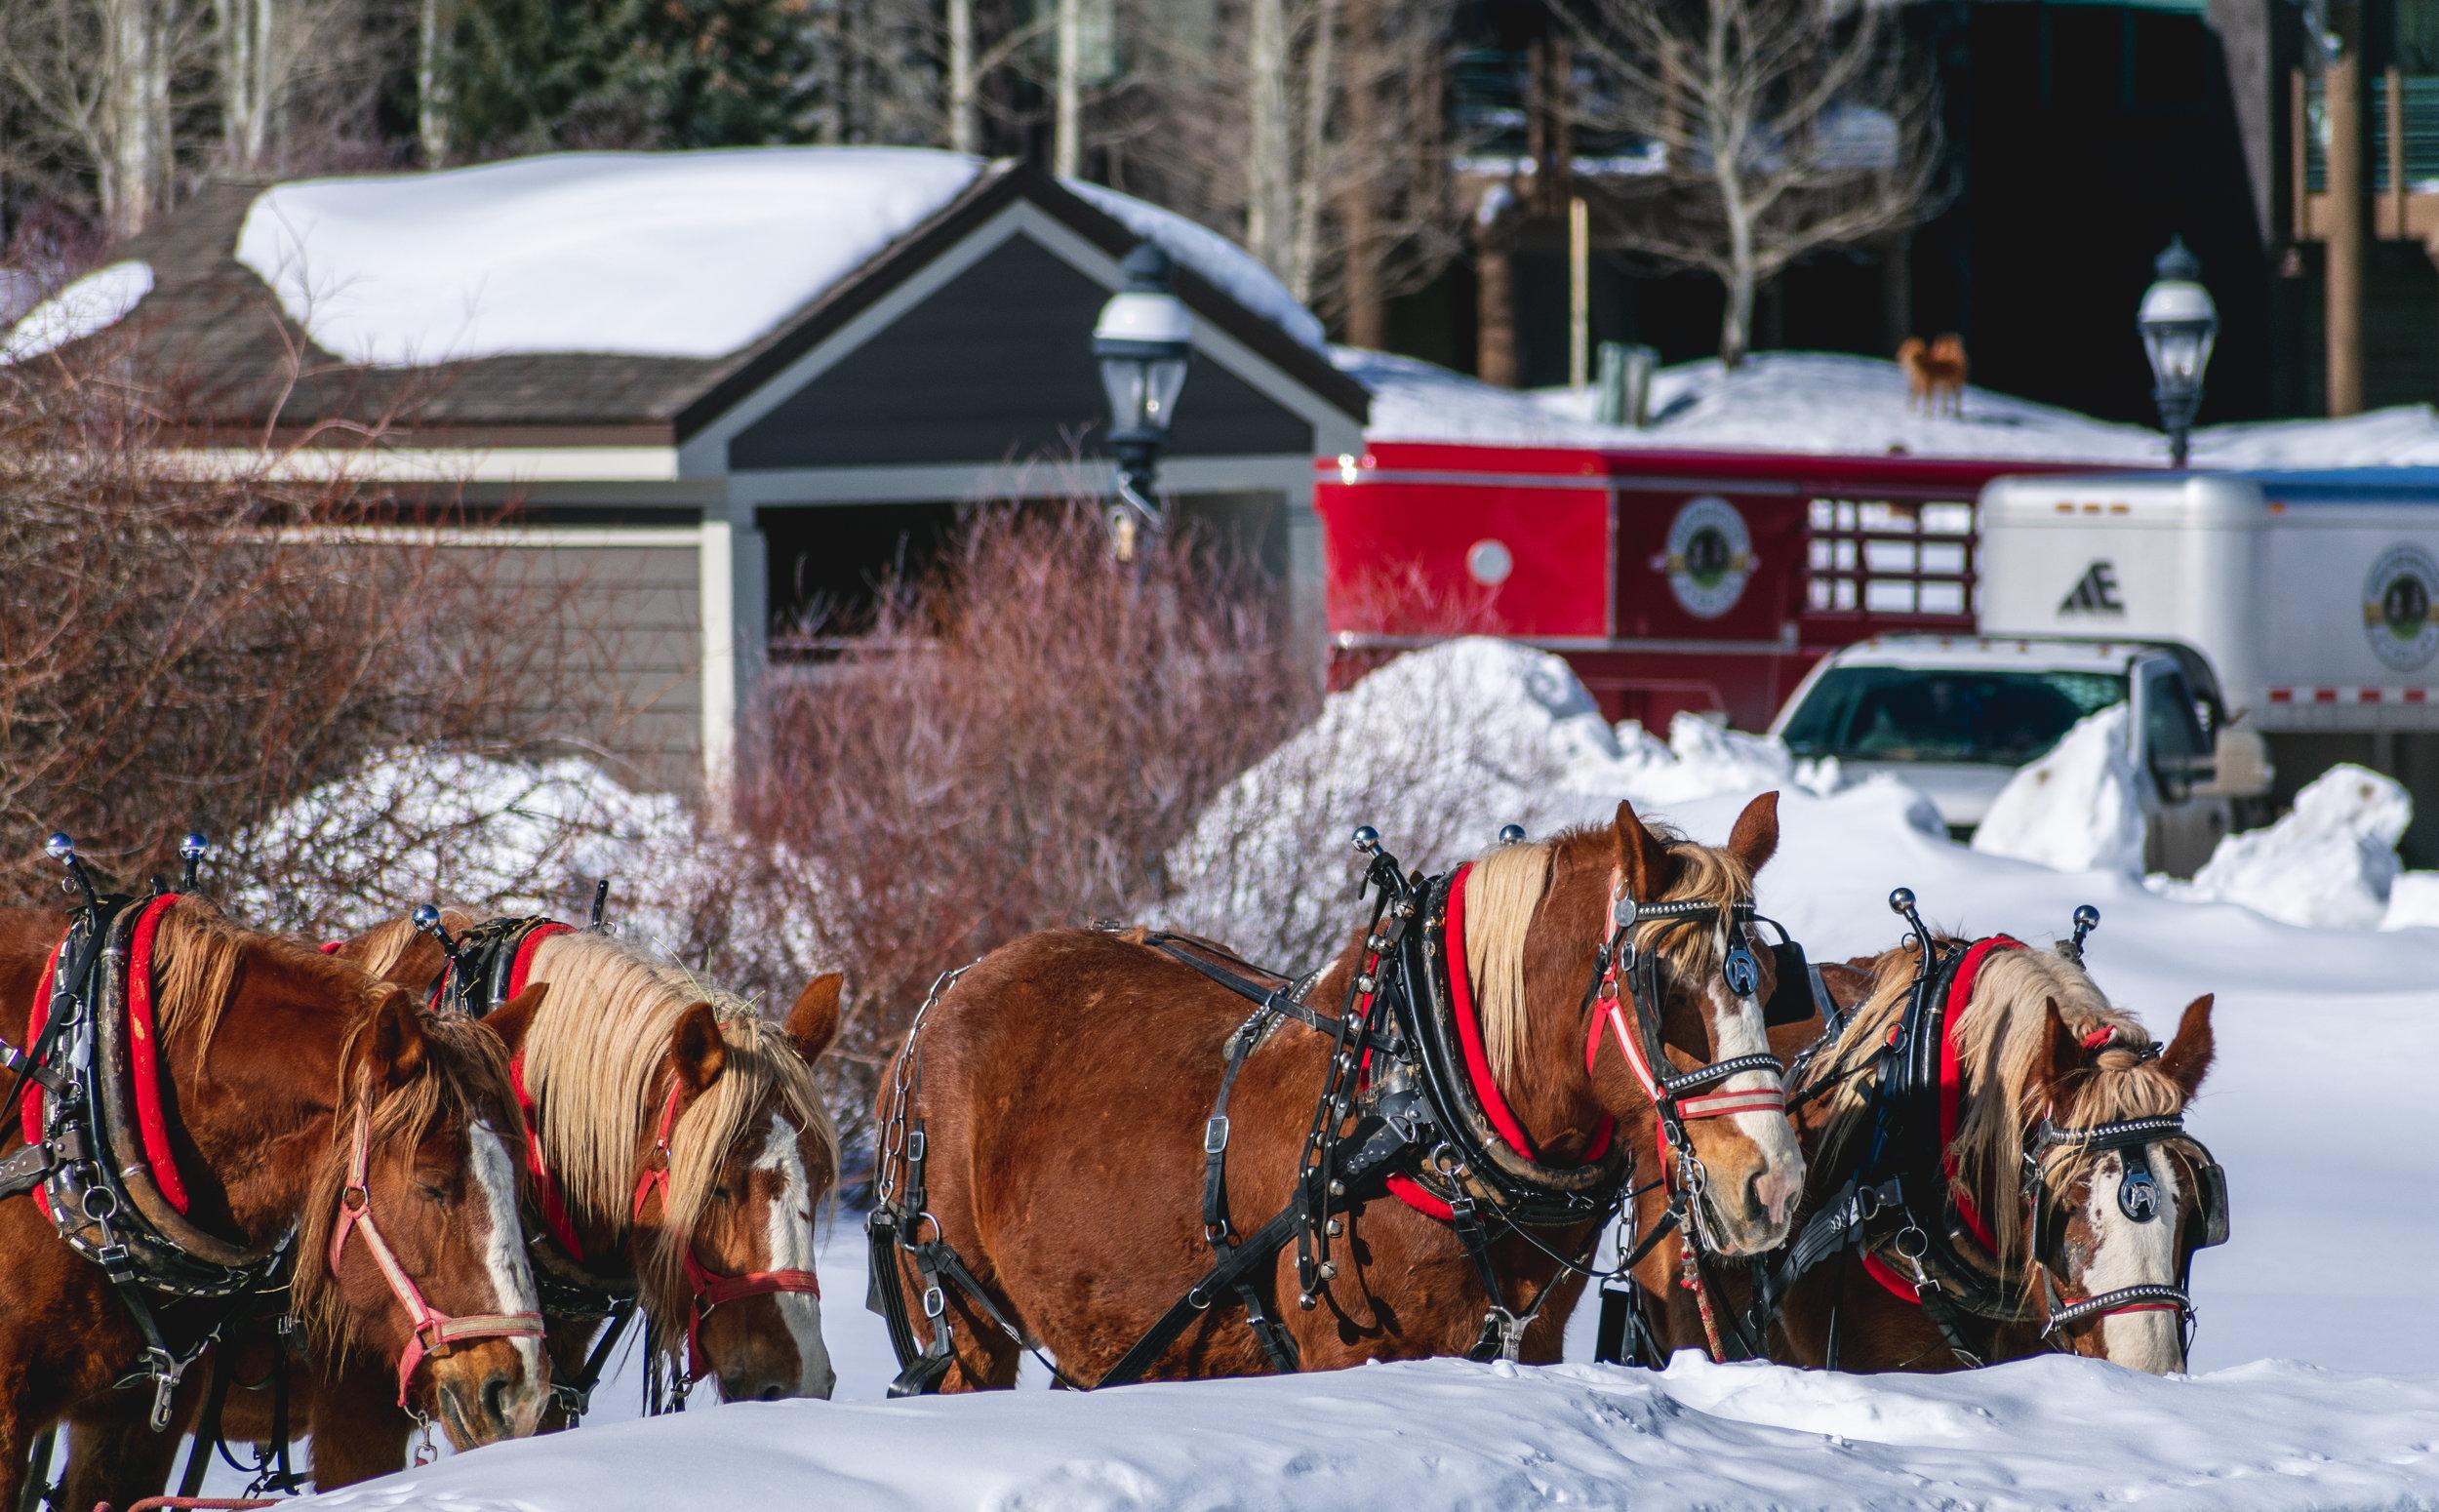 Take a winter sleigh ride